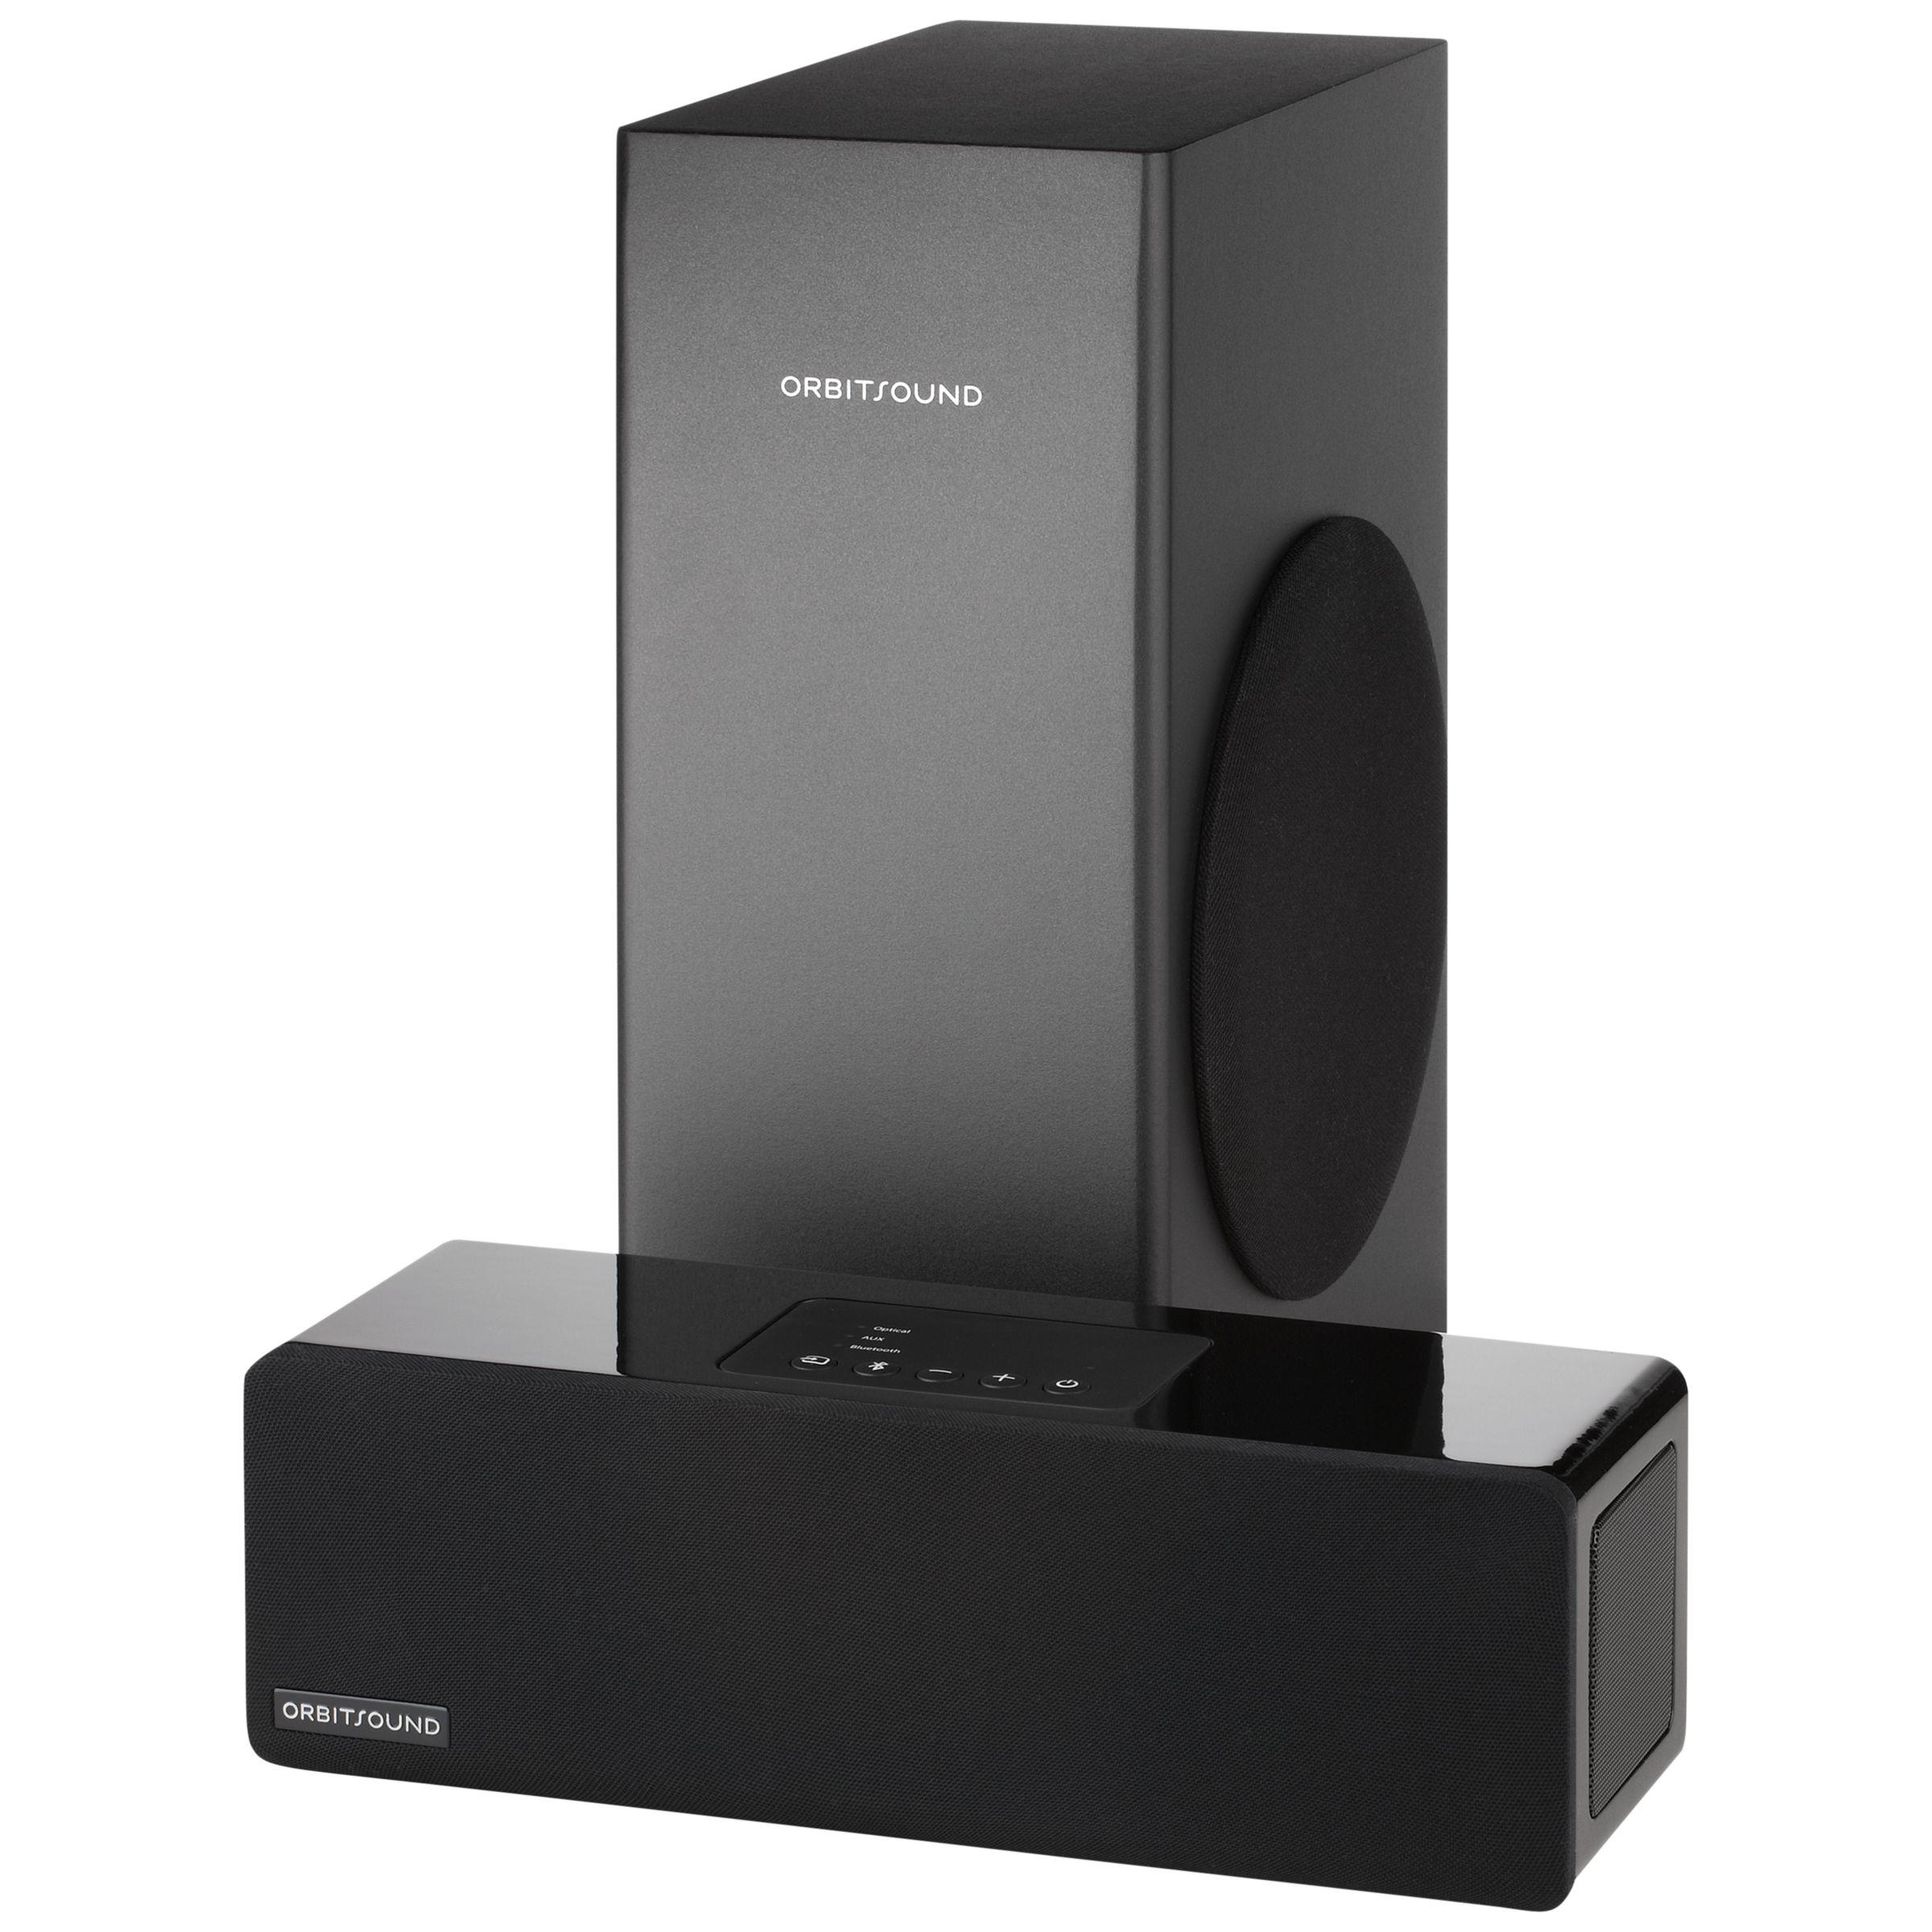 Orbitsound Orbitsound M9LX Bluetooth Sound Bar with Wired Subwoofer, Piano Black